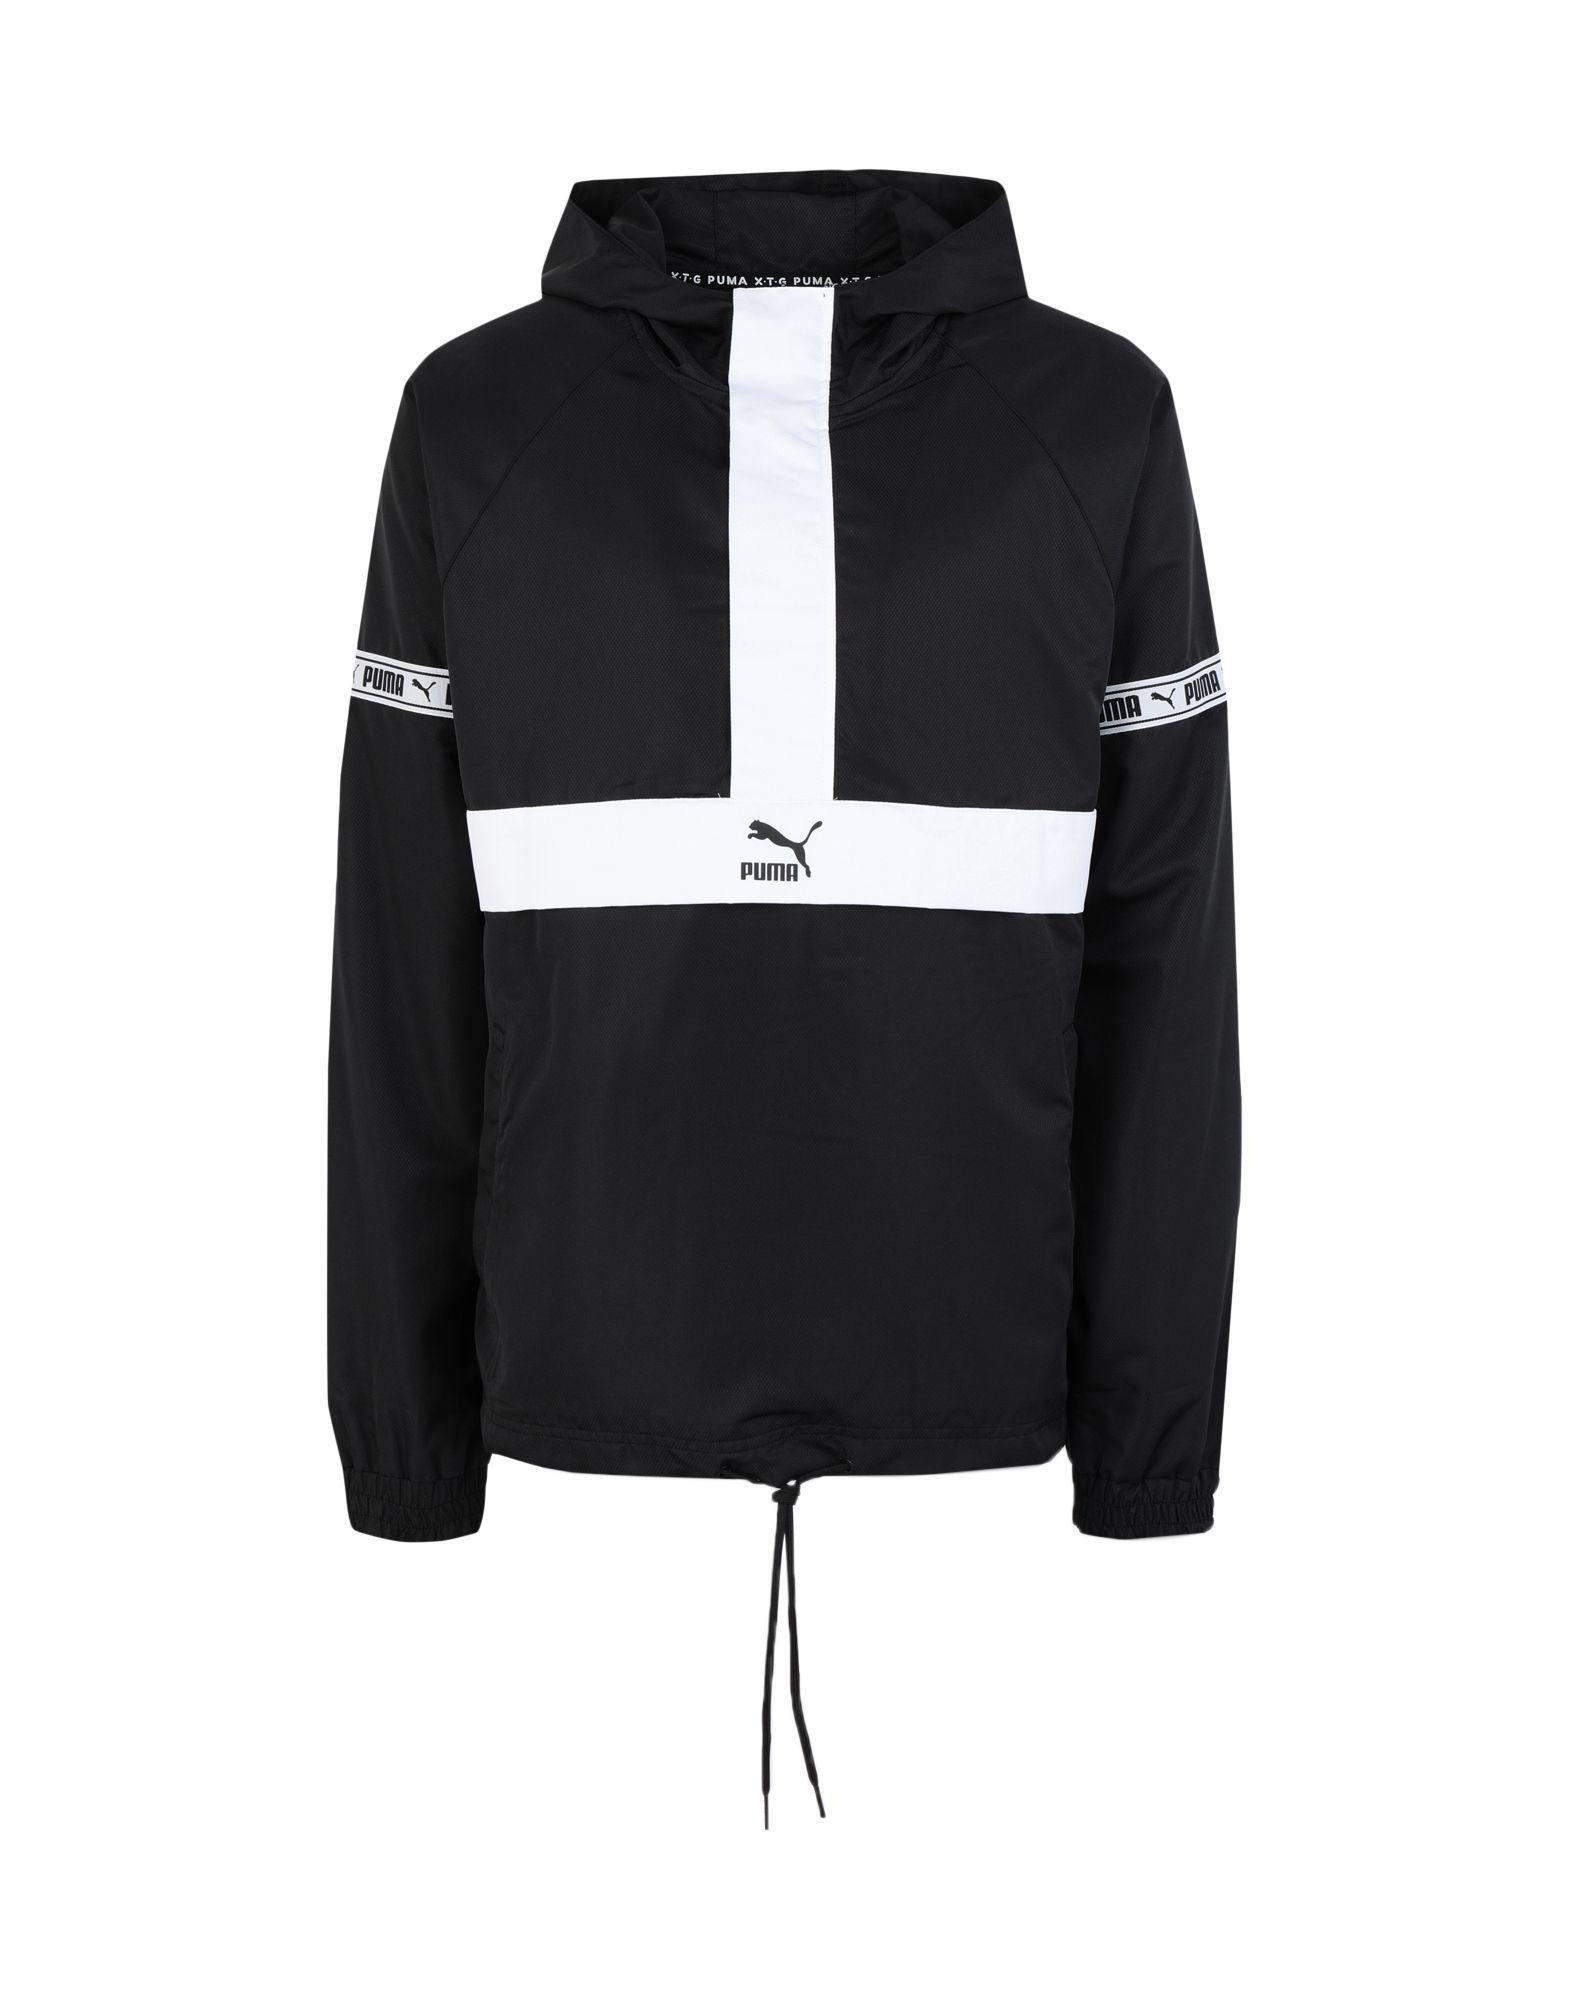 Puma Jacket In Black Modesens Mens Jacket Black Jackets Puma Jackets [ 2000 x 1571 Pixel ]